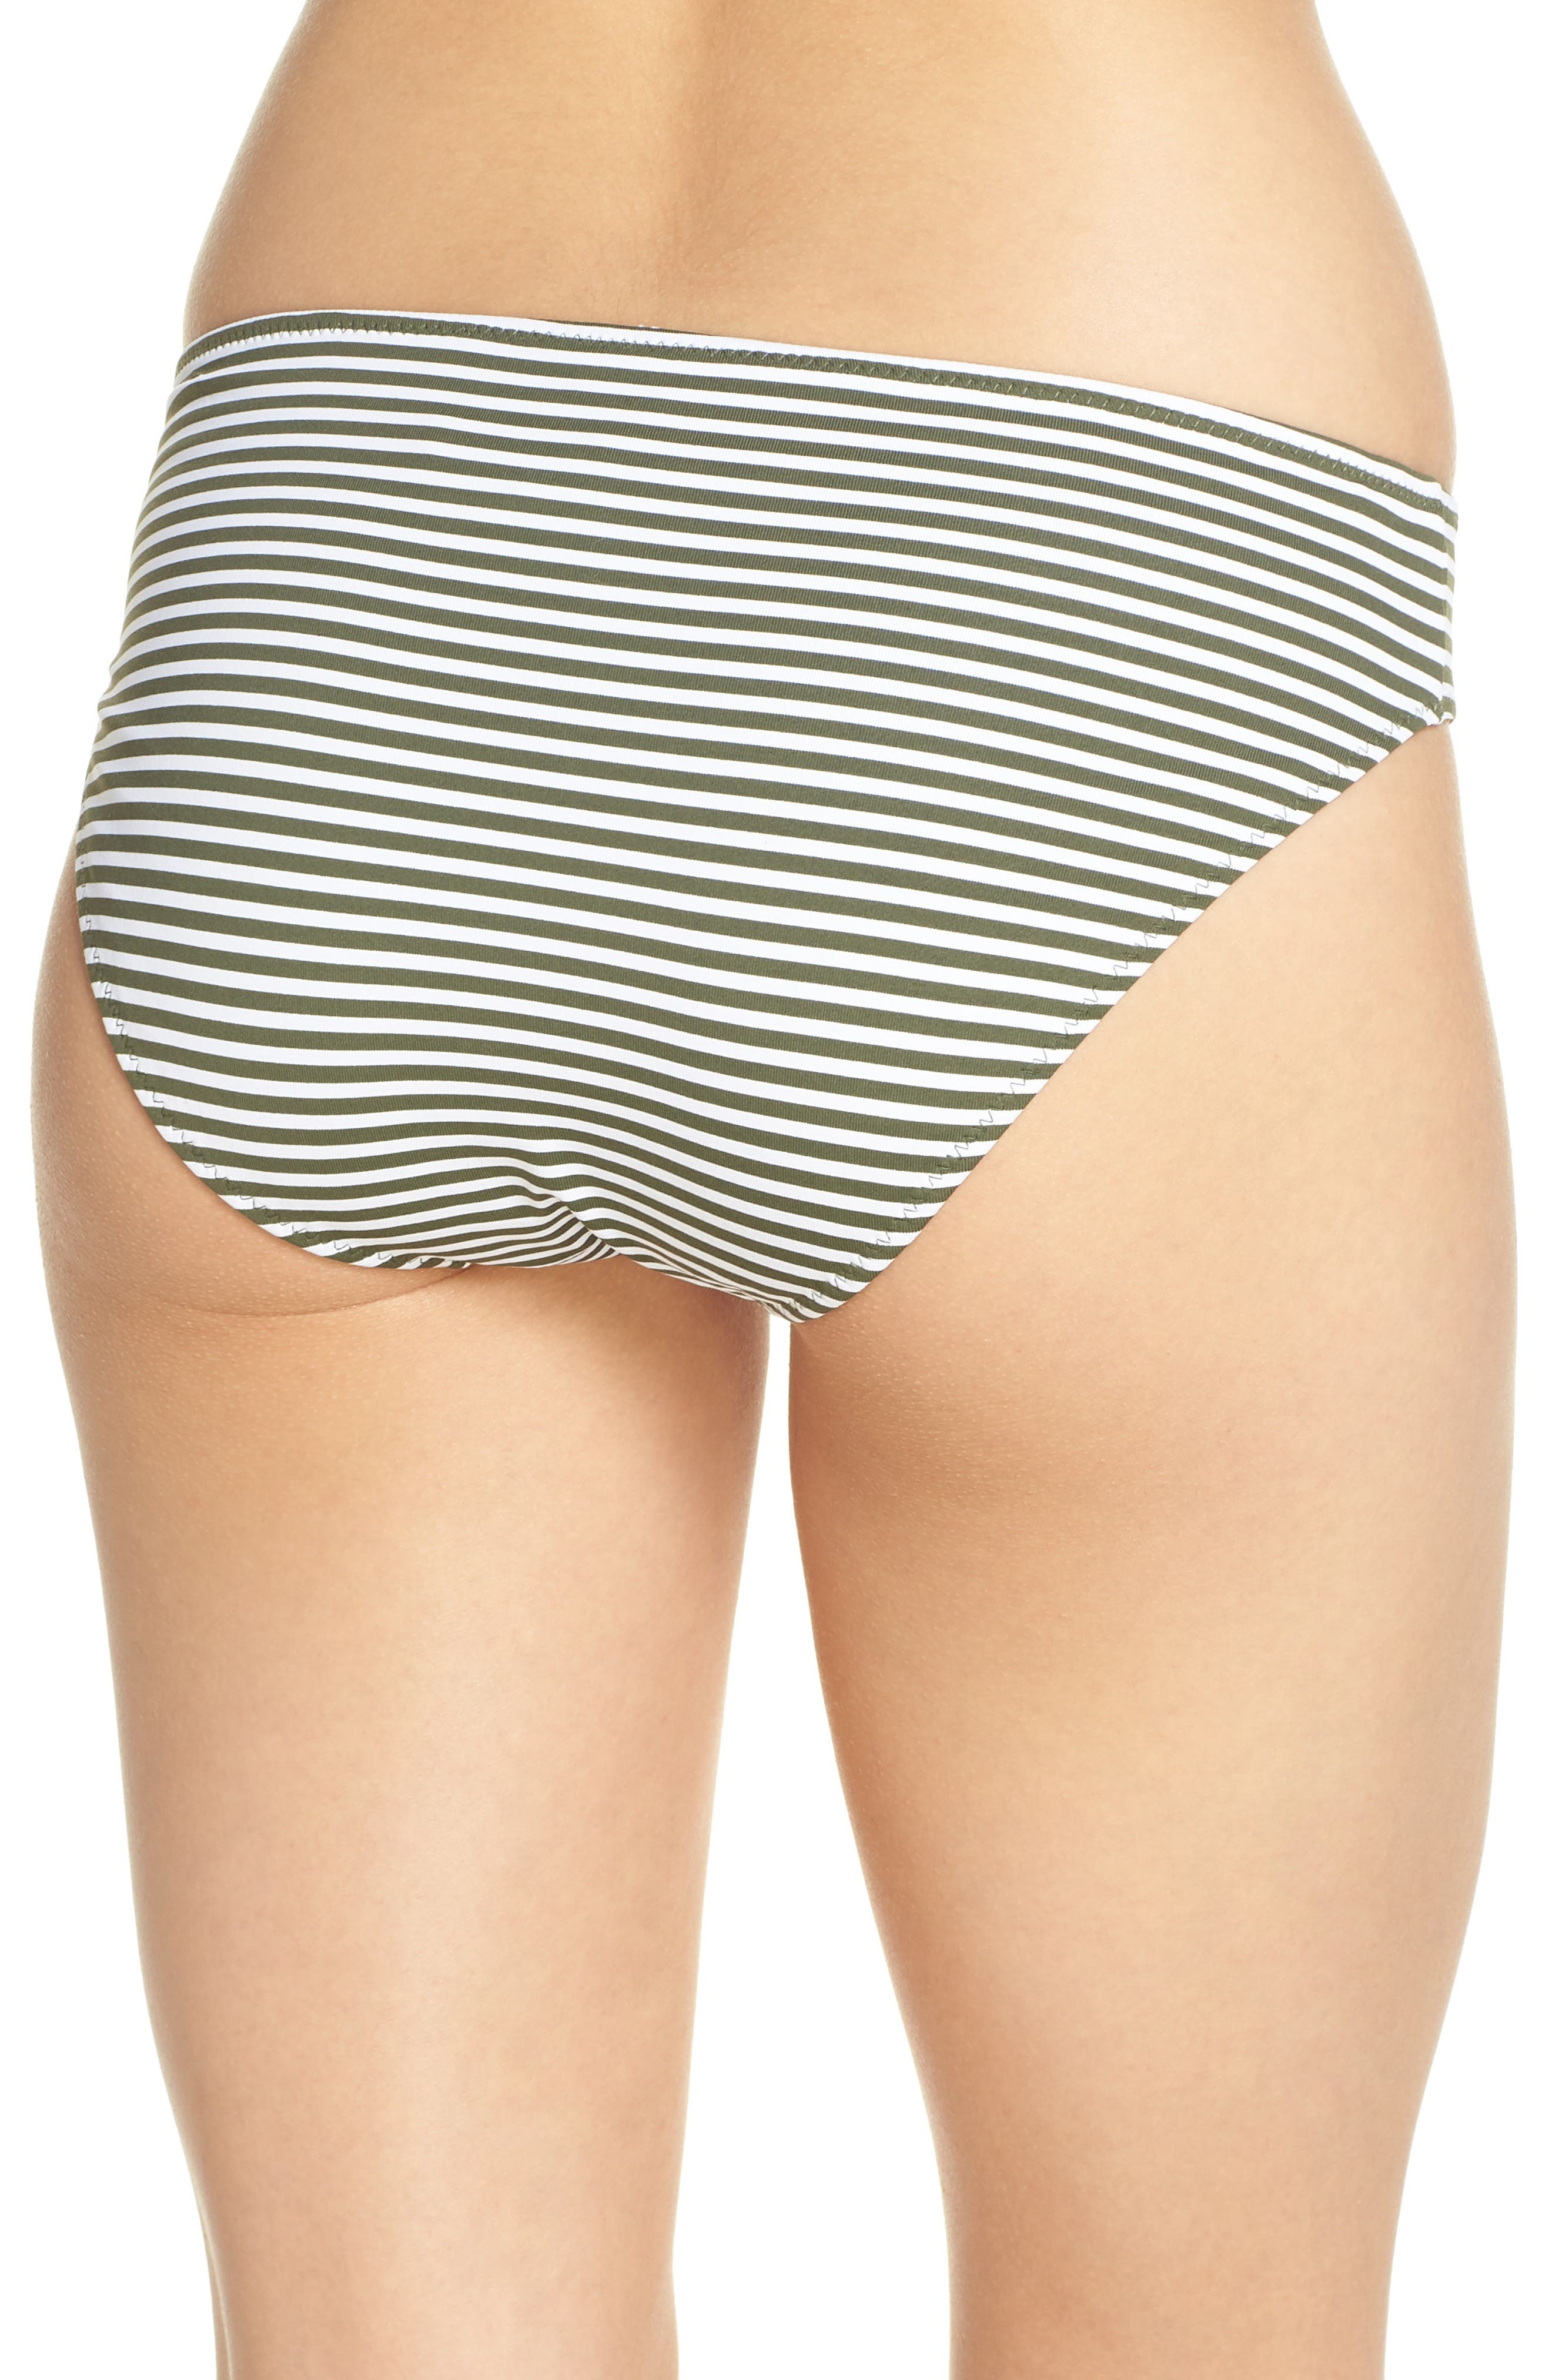 Reversible Hipster Bikini Bottoms,                             Alternate thumbnail 3, color,                             DARK TEA LEAF